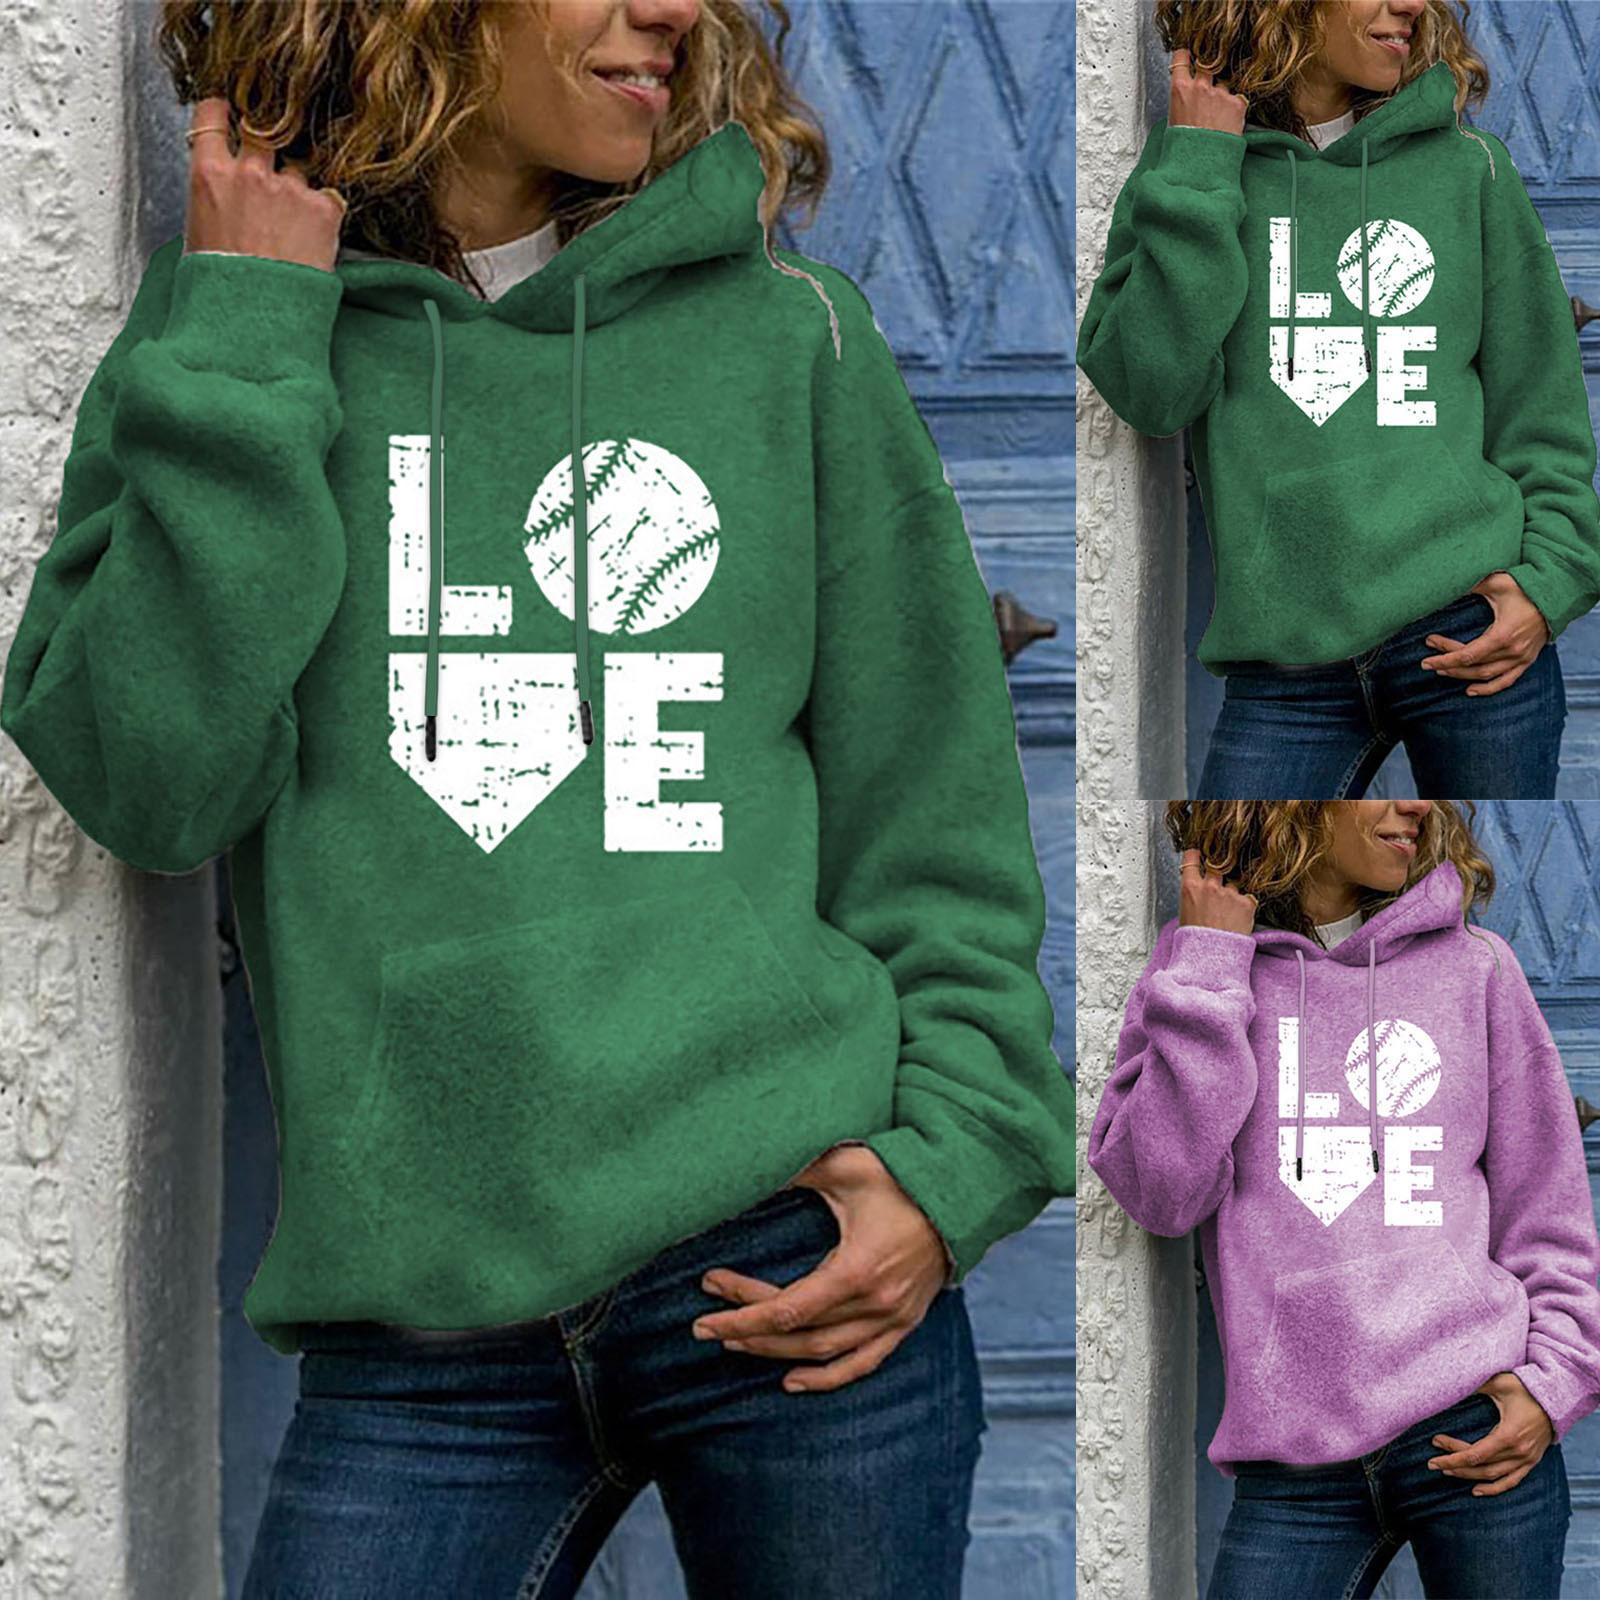 4# Sweater Women Winter Casual Long Sleeve Tops Ladies Print Pullover Кардиганы Женские 2020 Sweter Damski Свитер Женский Топ